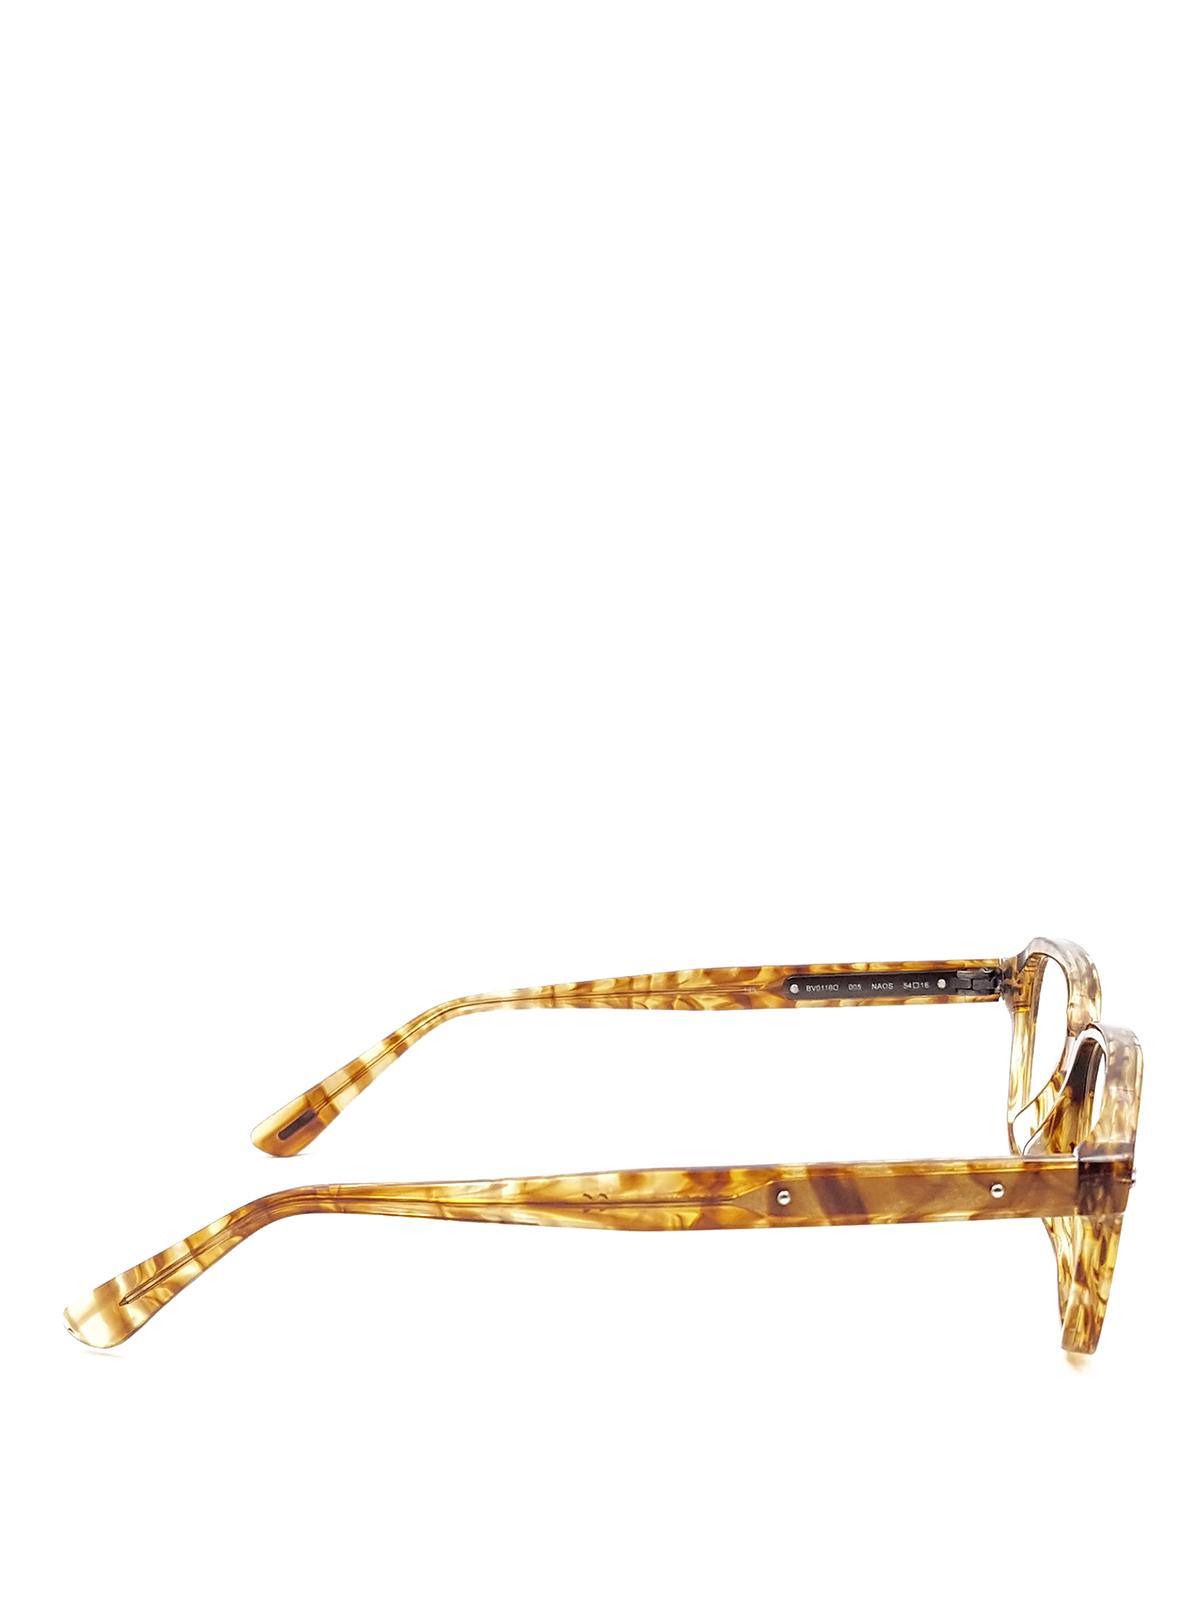 Brillen - Bunt von Bottega Veneta - Brillen | iKRIX